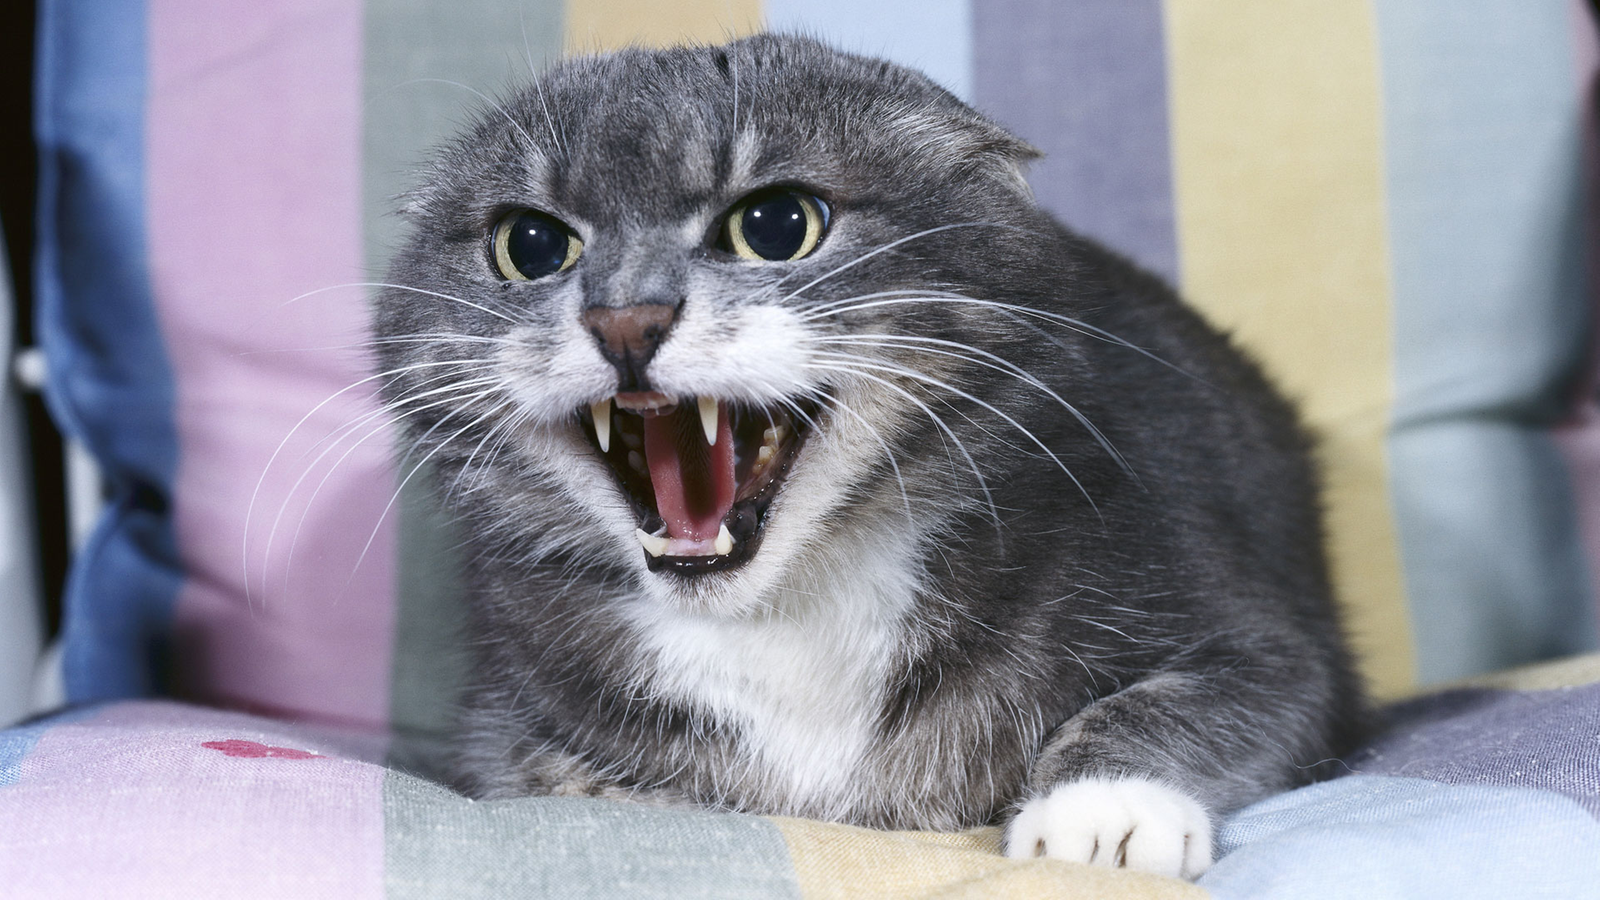 Katzen: Die Sprache der Katzen - Katzen - Haustiere